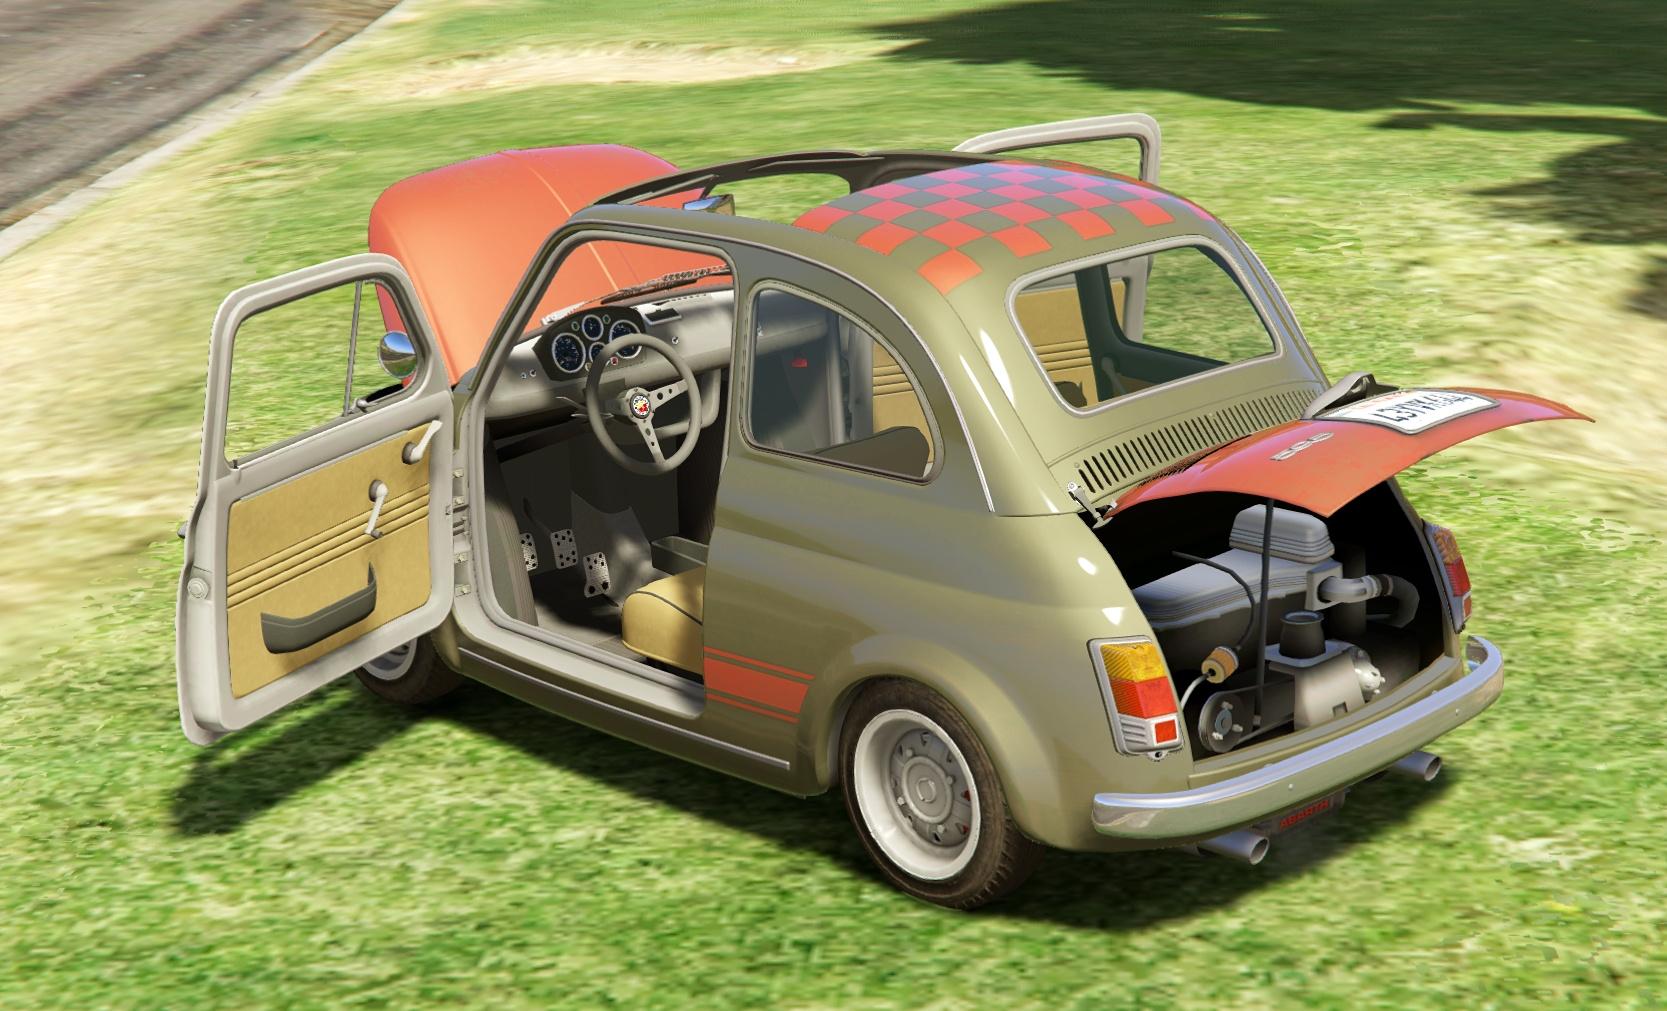 Fiat Abarth 595ss [Add-On / Rep | Tuning | Livery] - GTA5-Mods.com